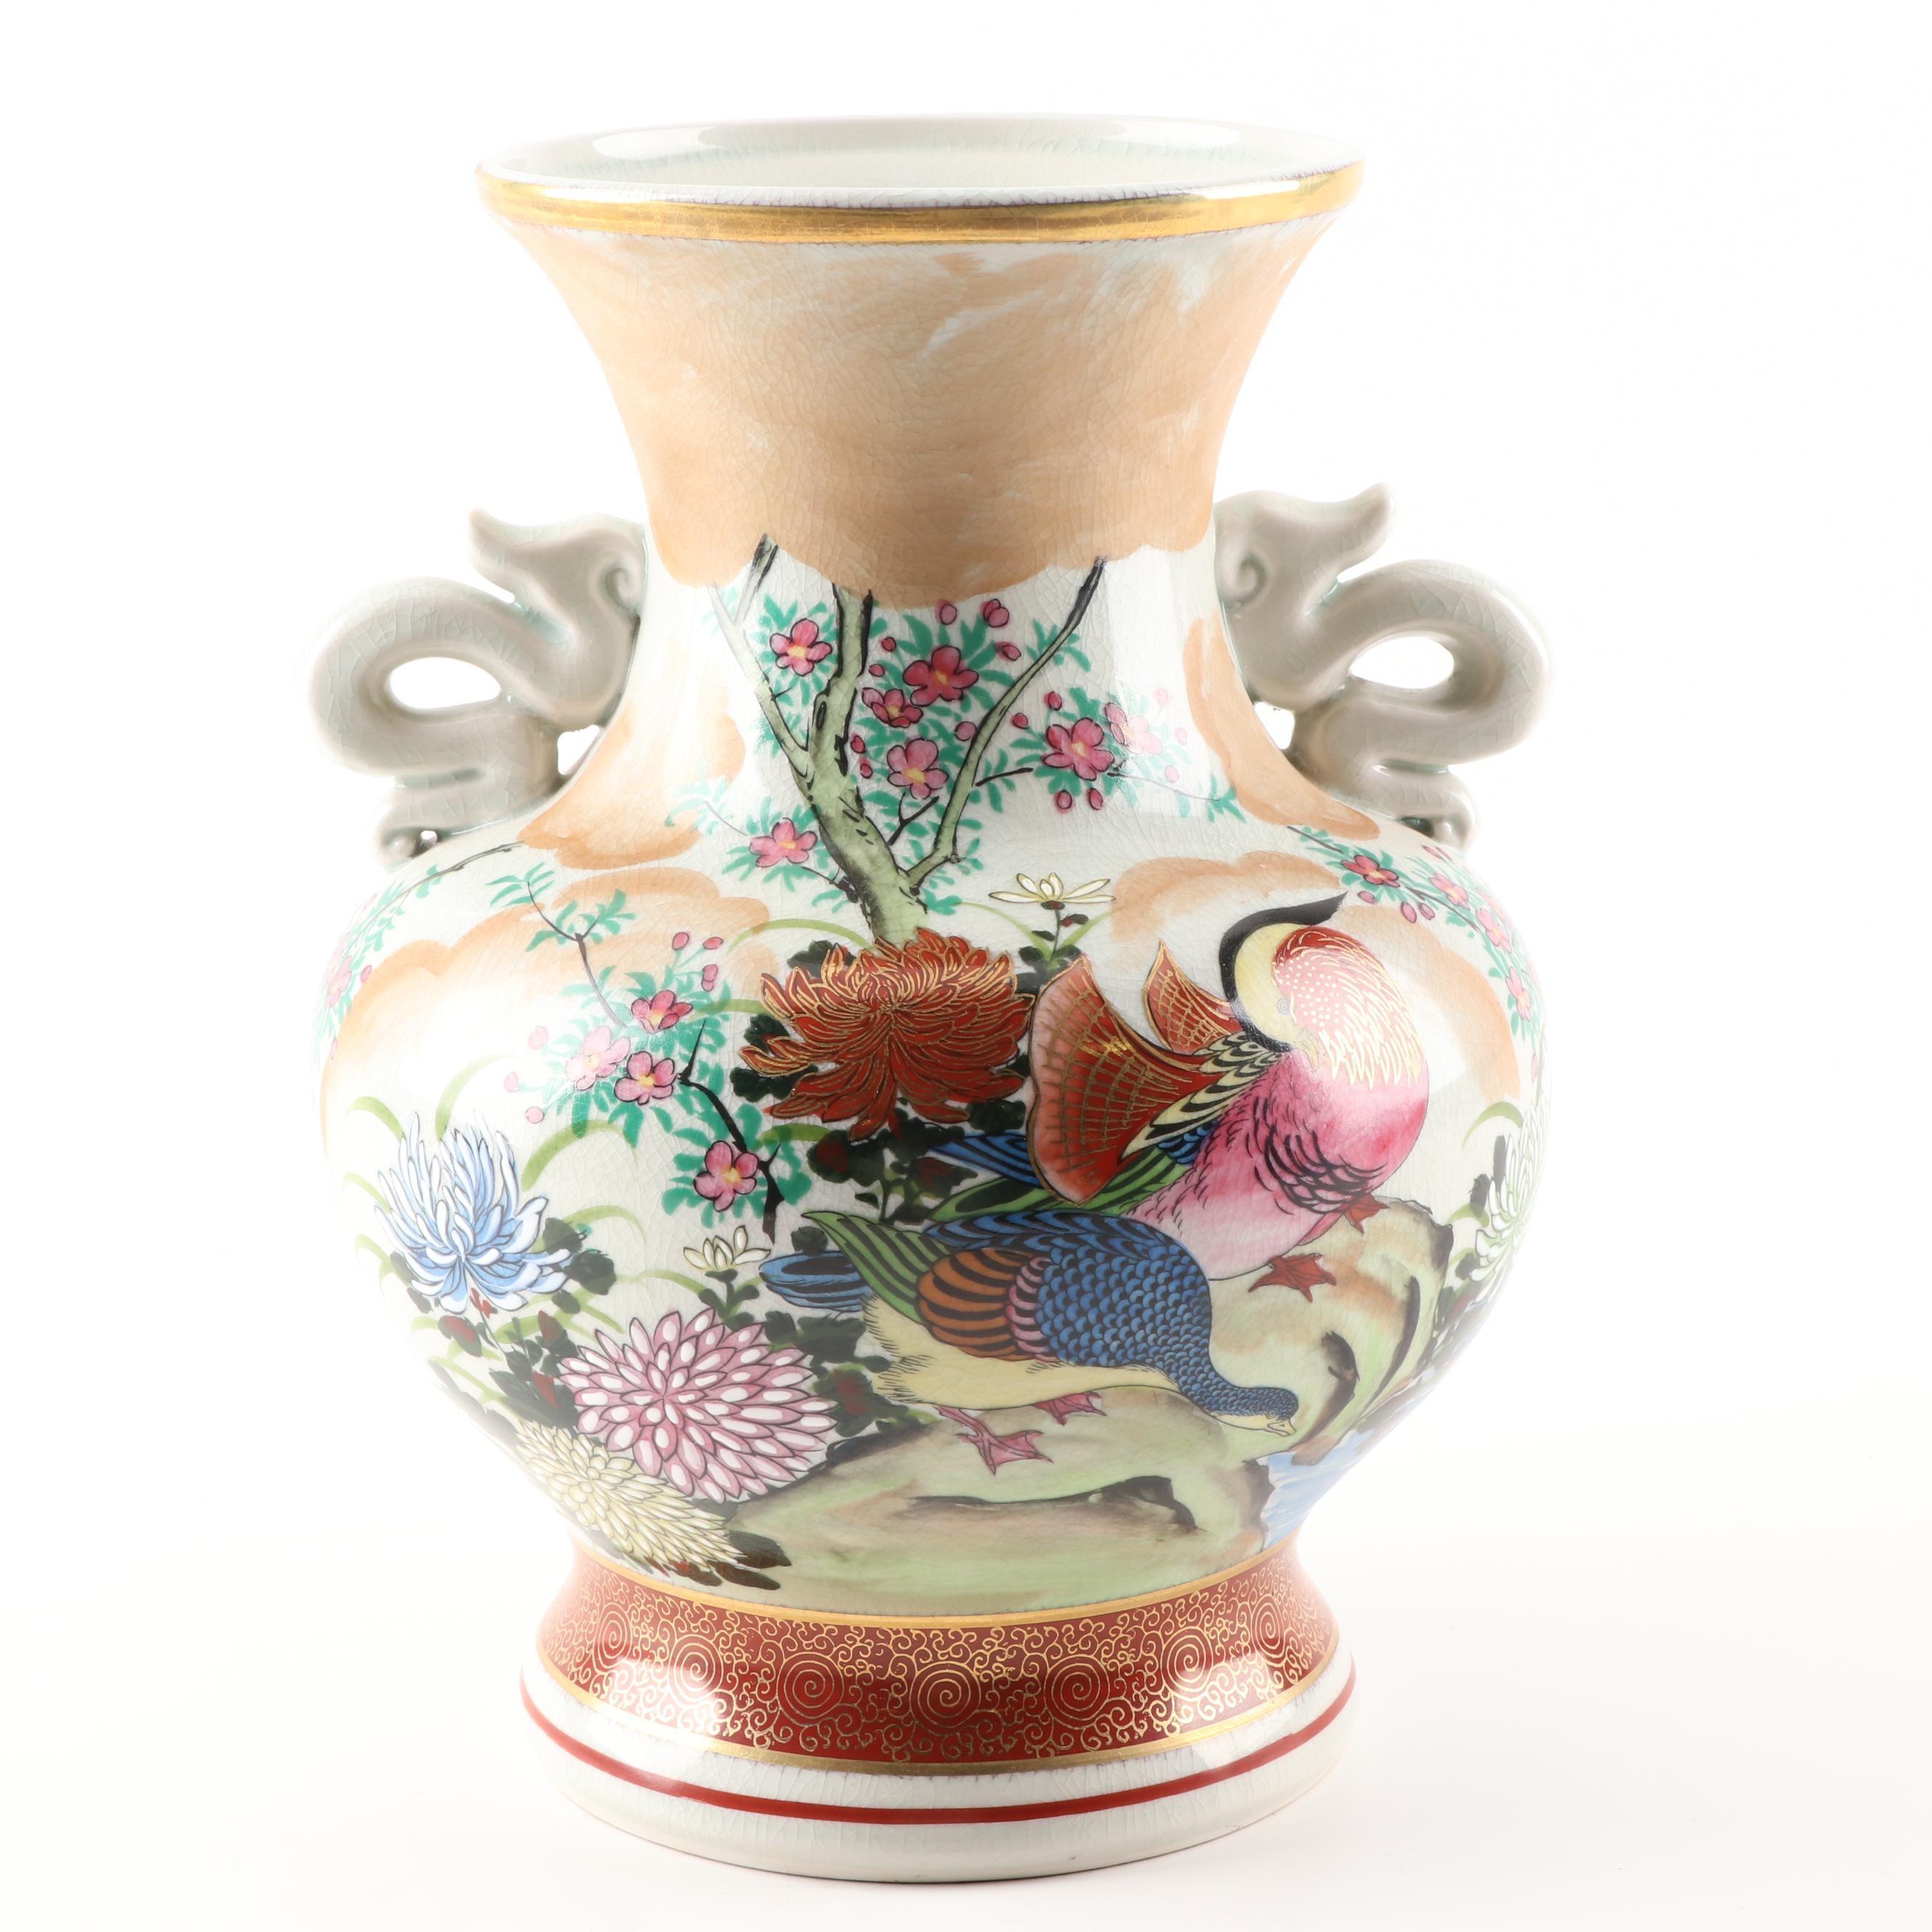 Japanese Hand-Painted Kutani Ware Porcelain Vase